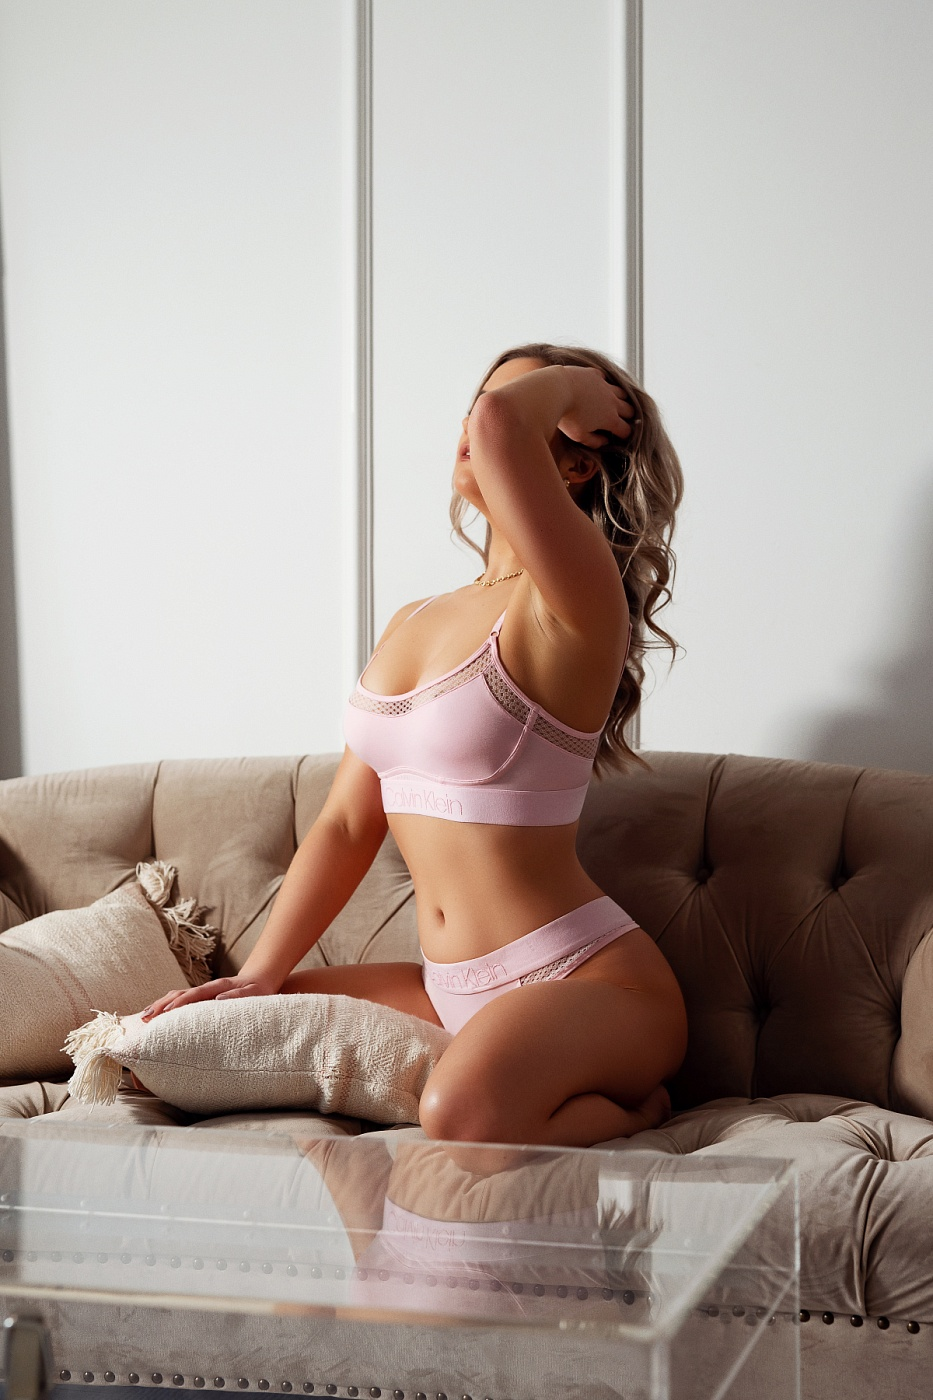 Amelia Belle